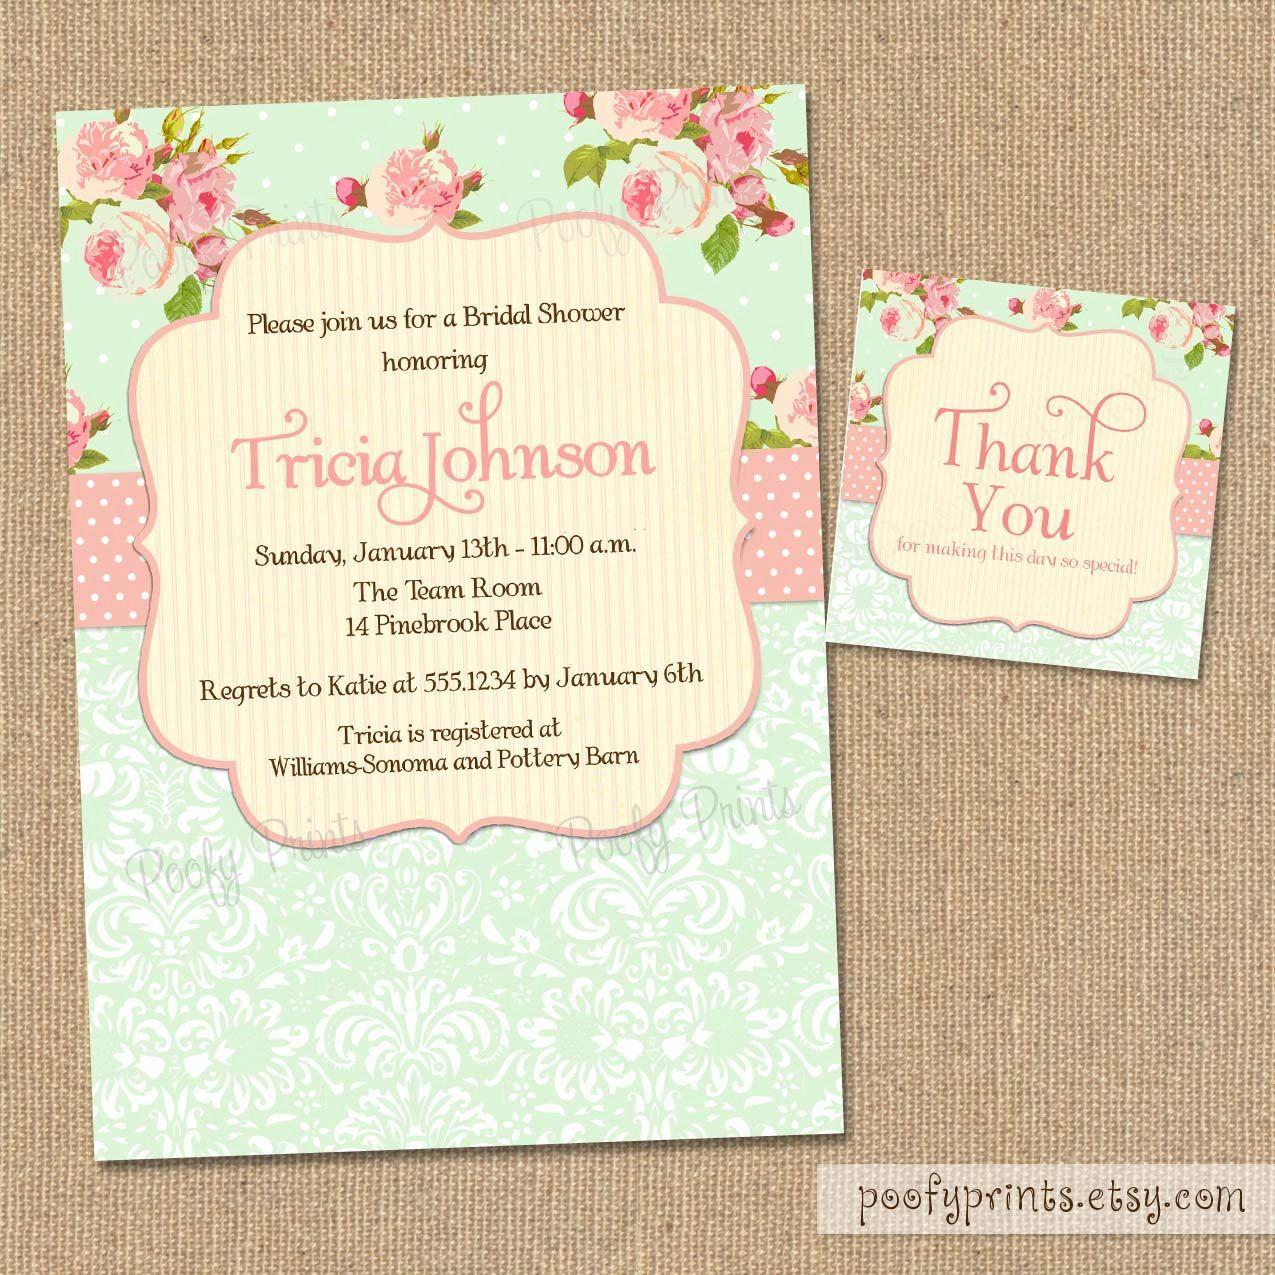 Shabby chic bridal shower invitations free matching favor tags shabby chic bridal shower invitations diy printable shabby chic invitations free matching thank you tags 2000 via etsy filmwisefo